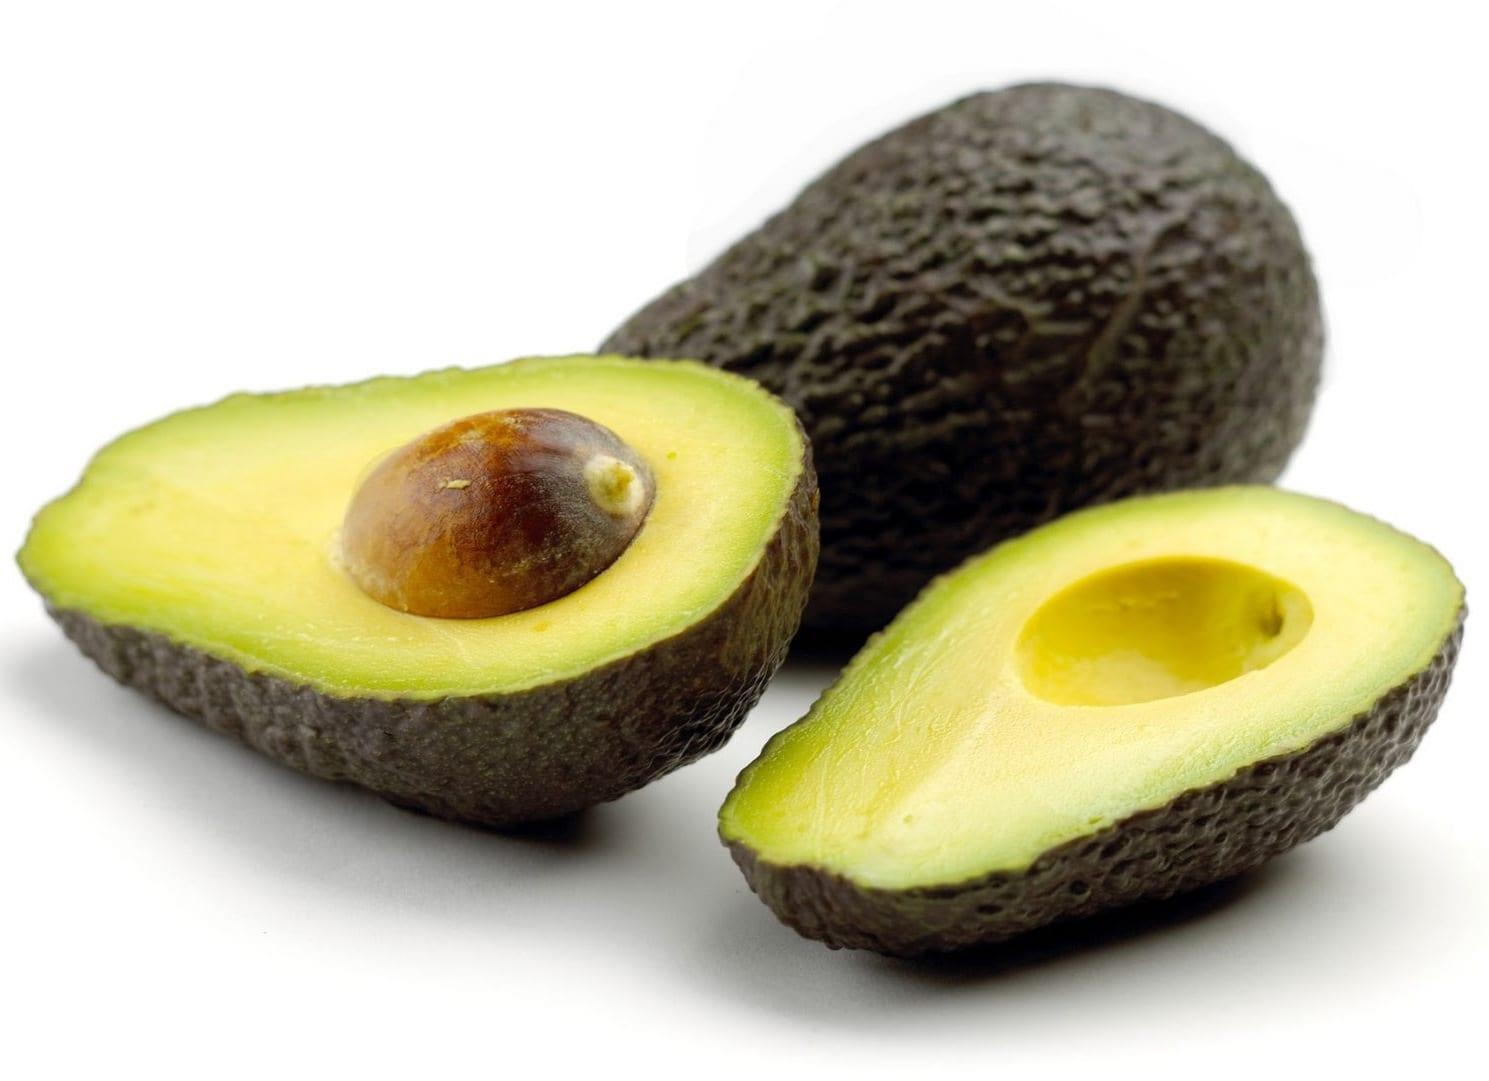 Rijpe avocado of niet?